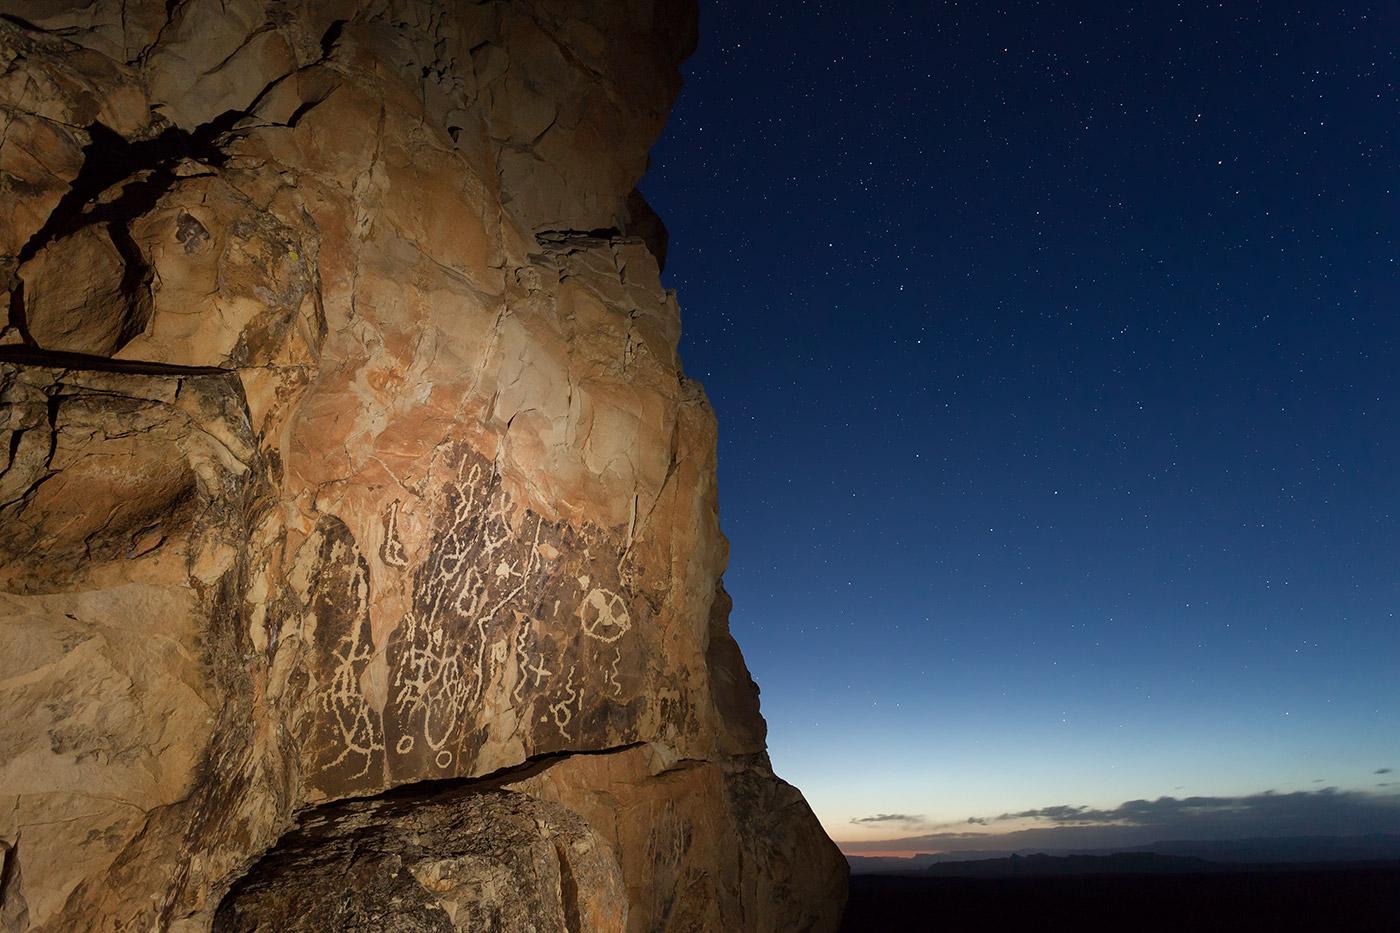 Ancient-Cultures_ABP_Petroglyphs-Big-Bend-National-Park.jpg